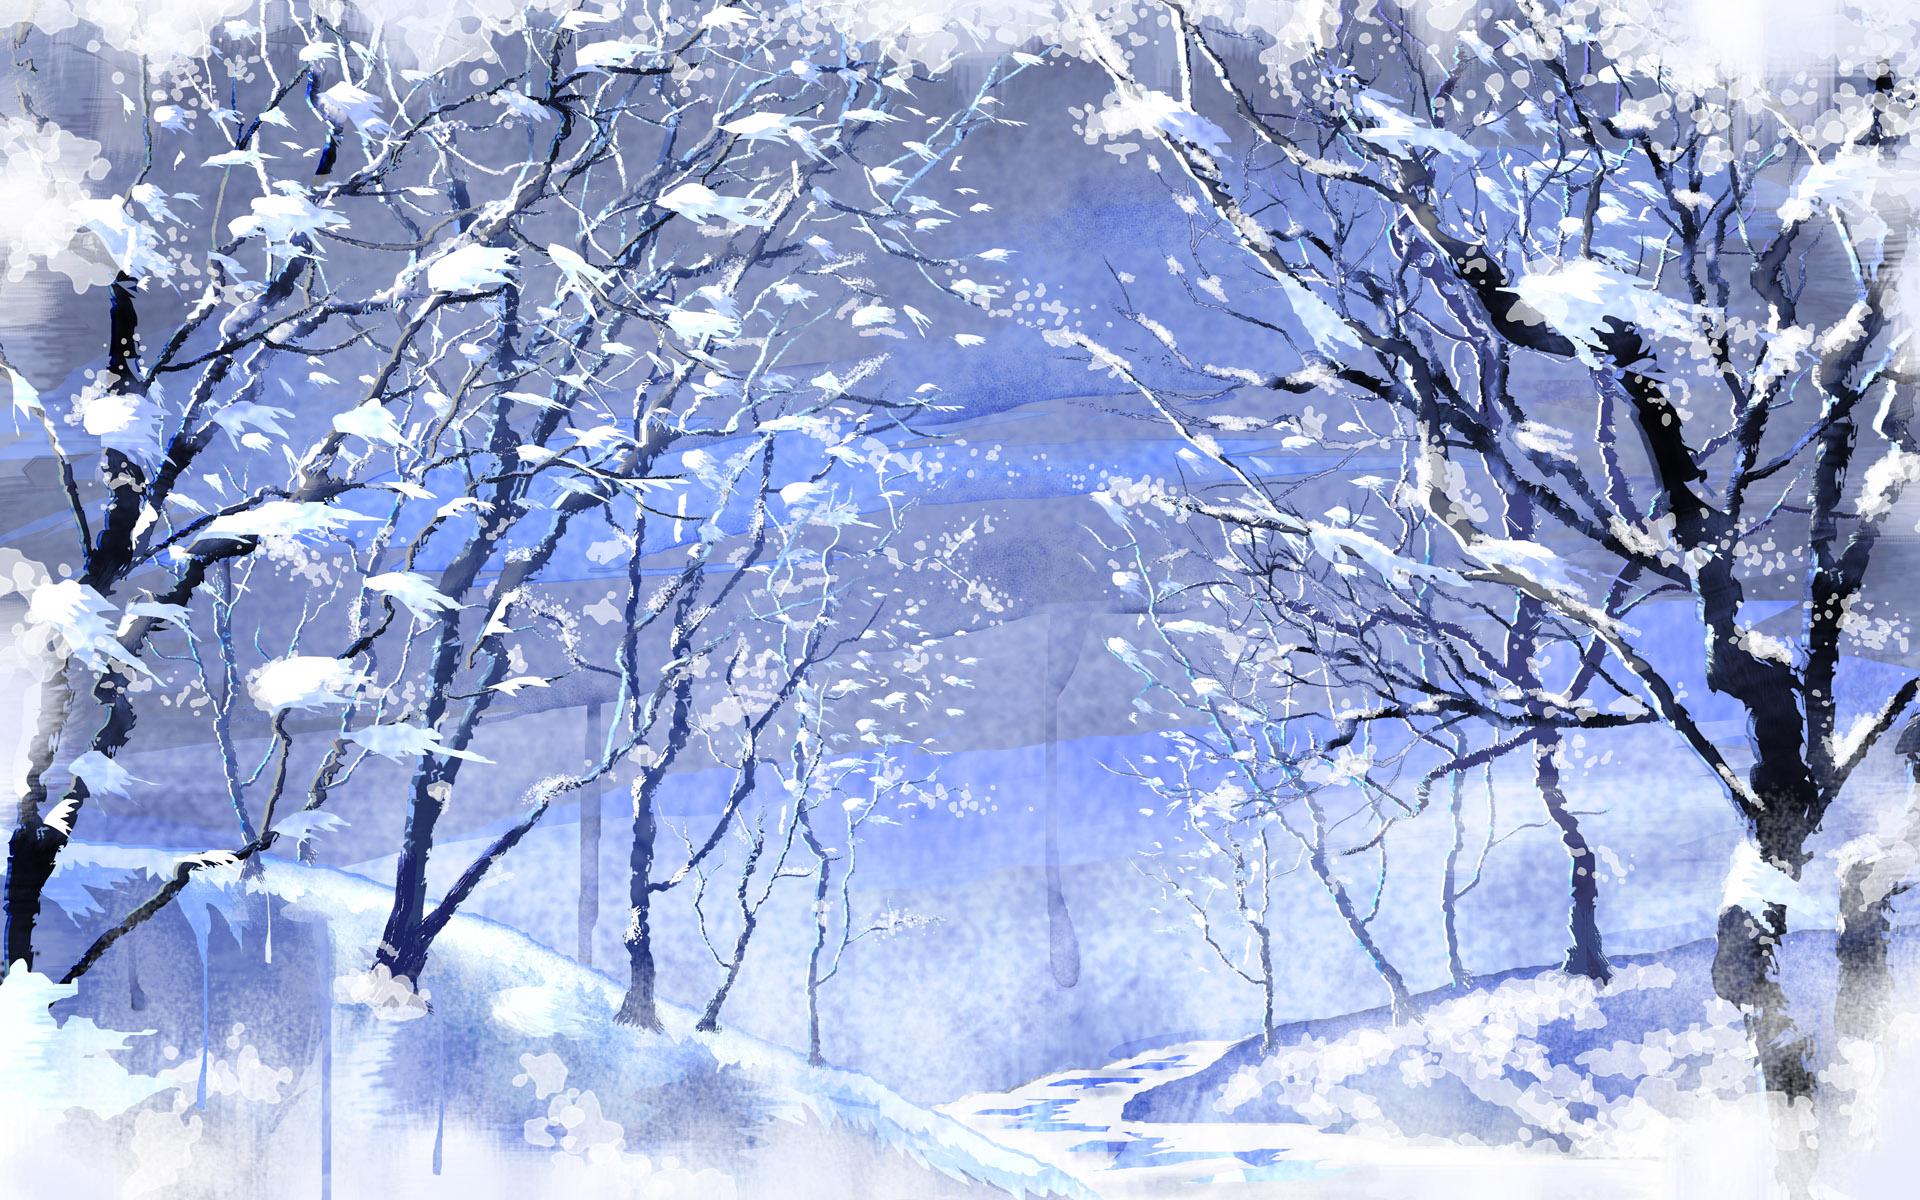 free winter scene wallpaper download the free winter scene wallpaper 1920x1200